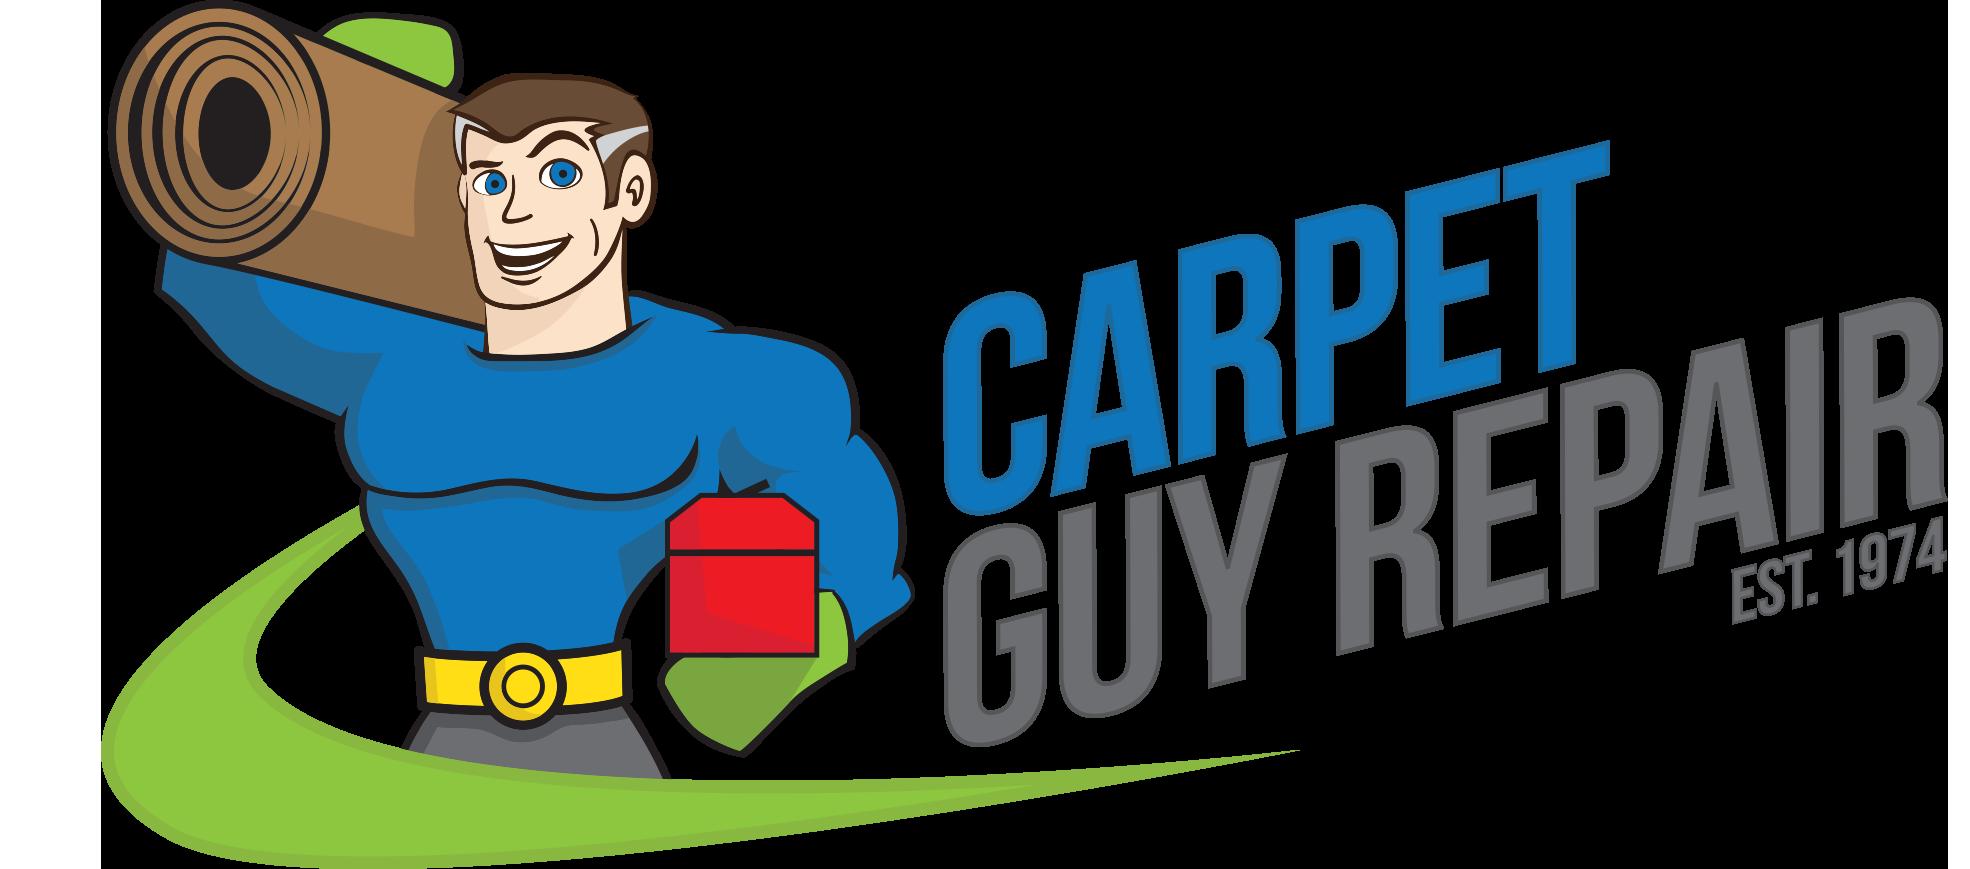 Carpet clipart carpet installation. Home guy repair